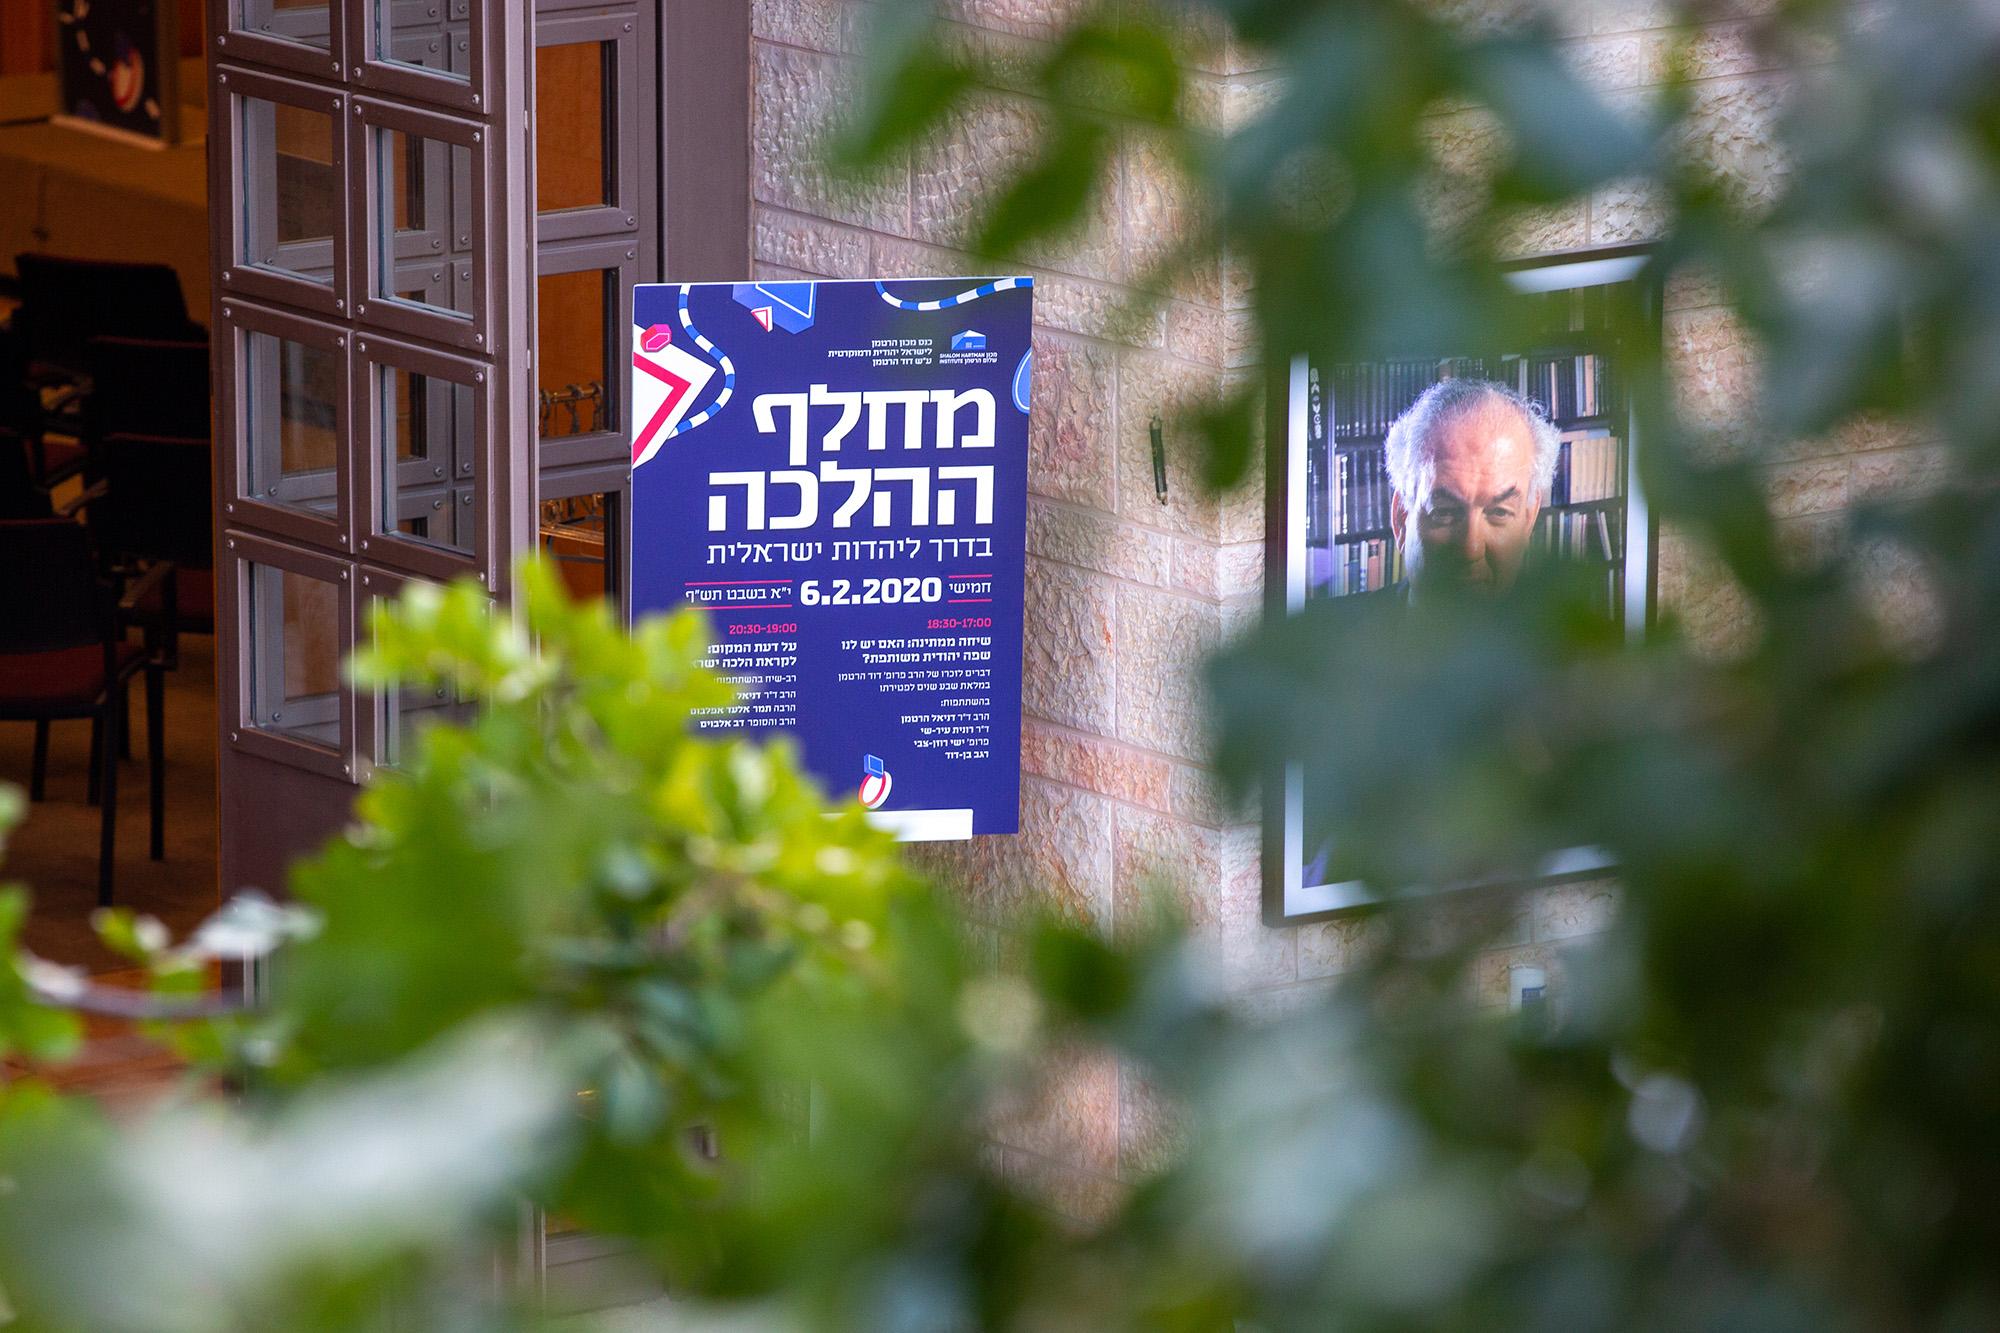 David Hartman Memorial Conference for a Jewish-Democratic Israel